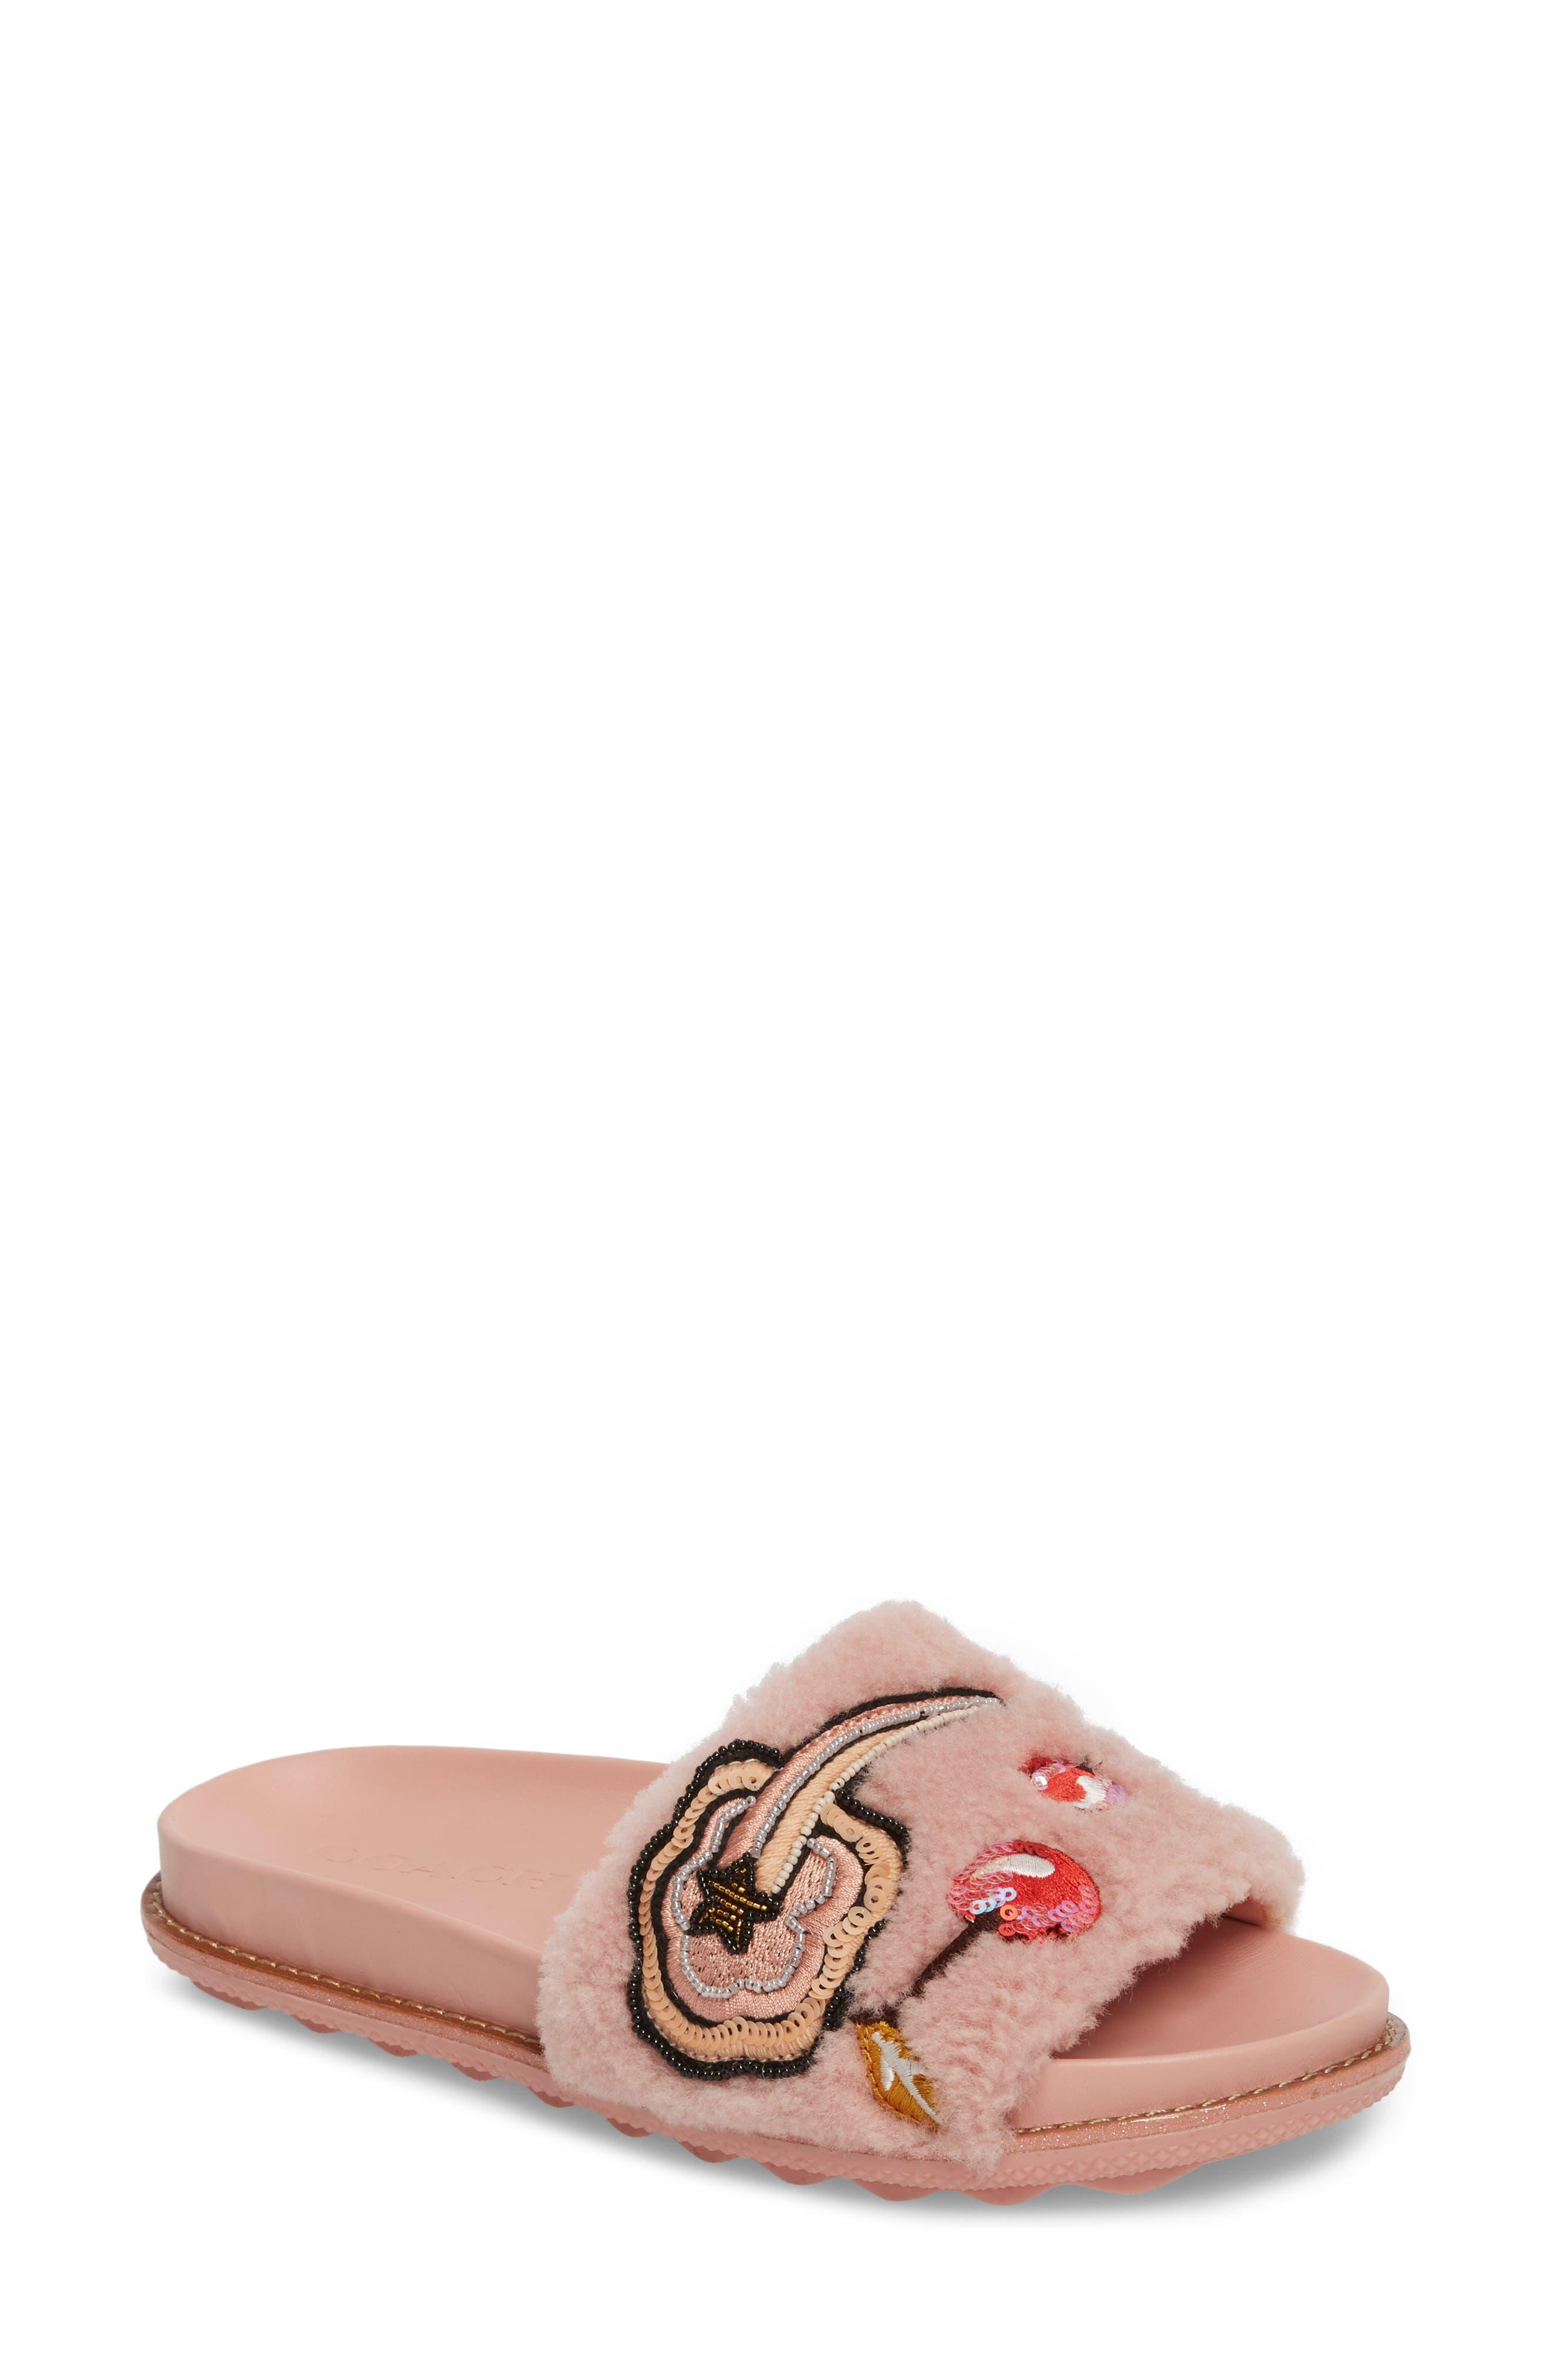 COACH Patch Genuine Shearling Slide Sandal (Women)